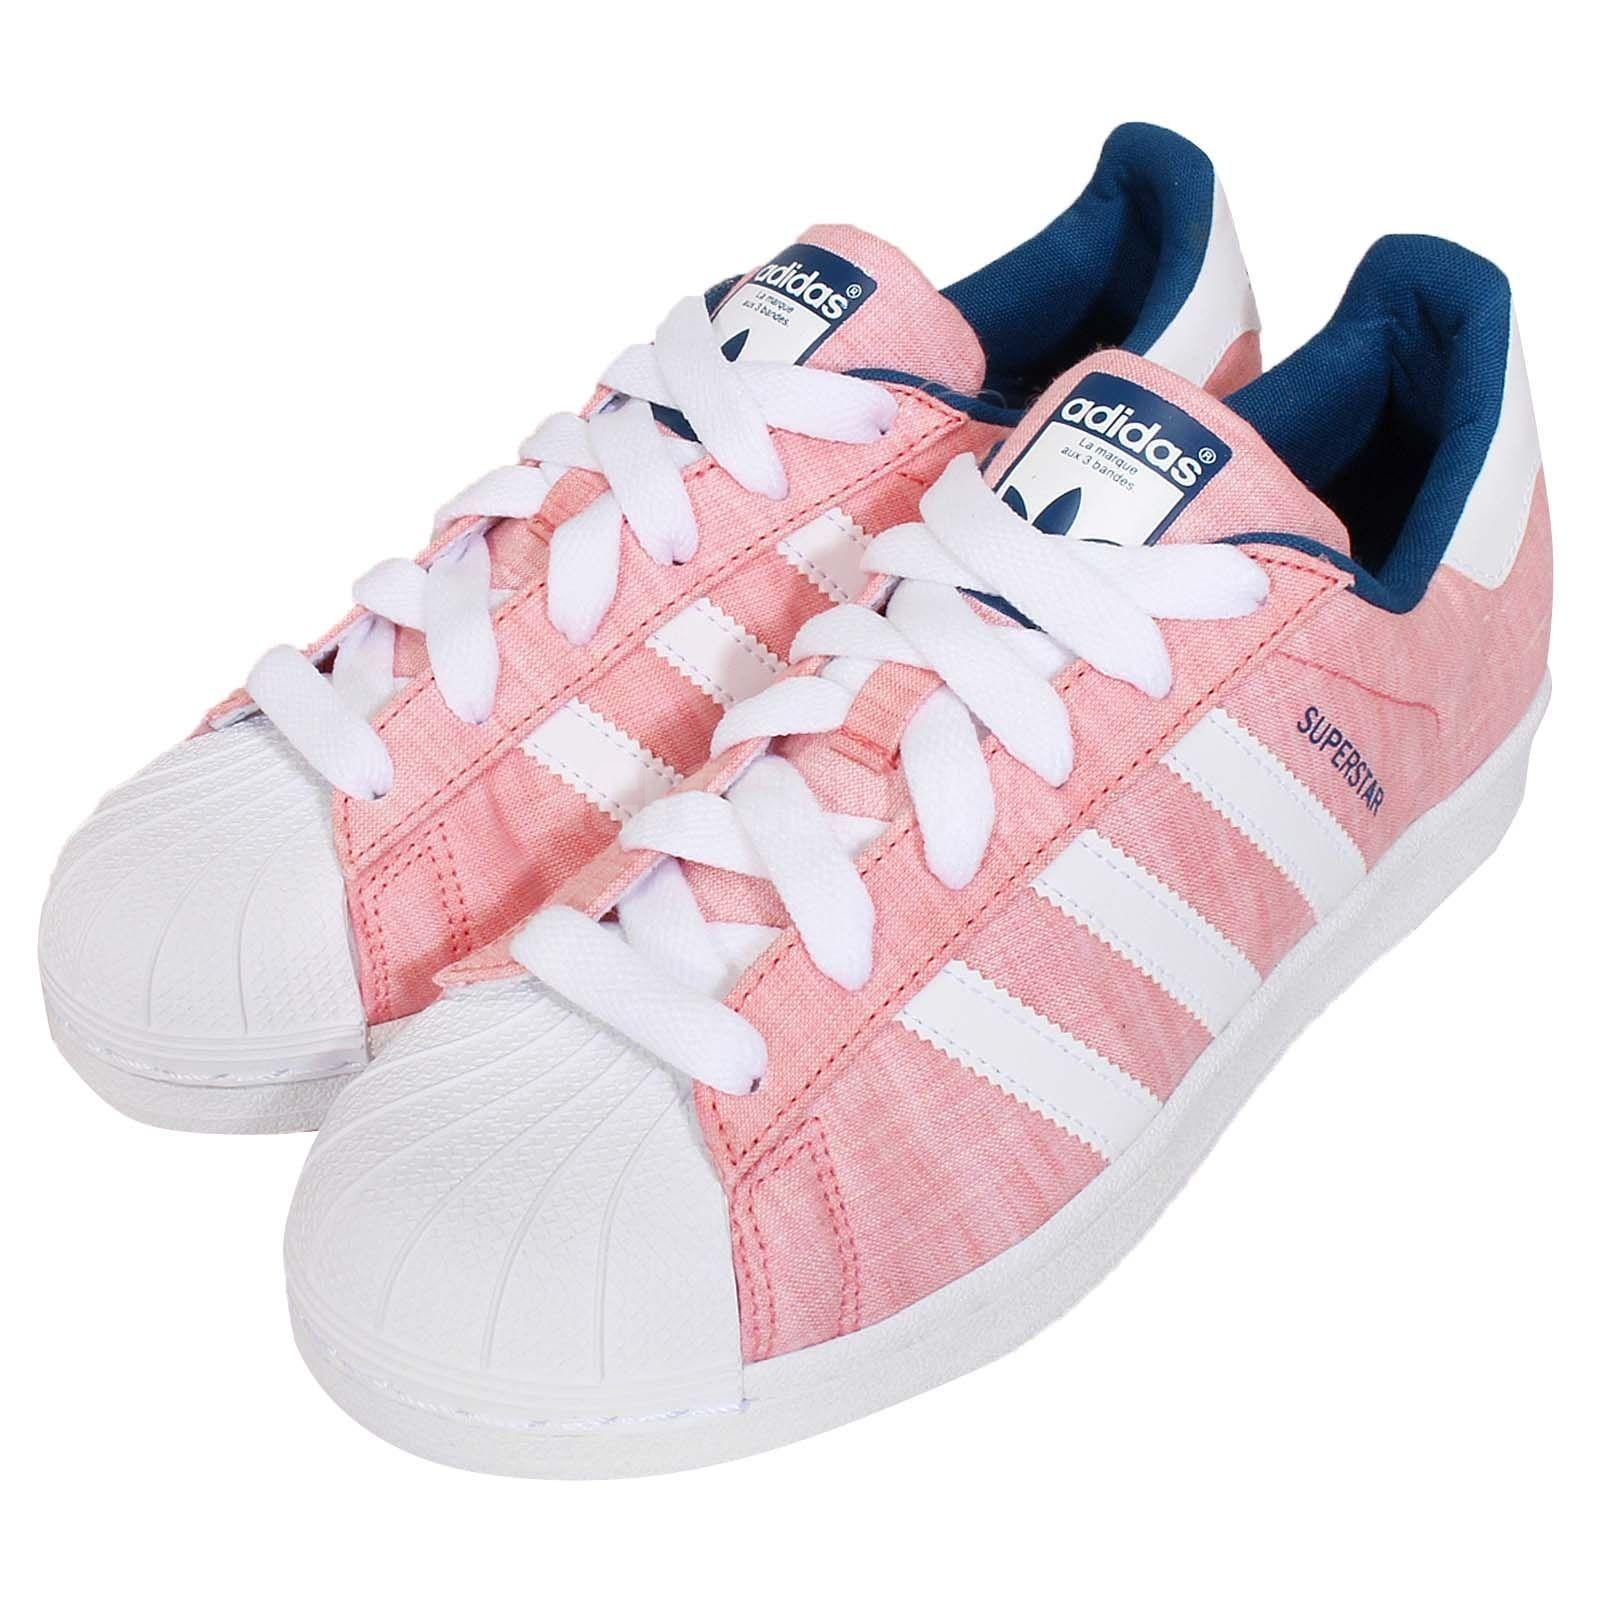 adidas superstar pink and blue